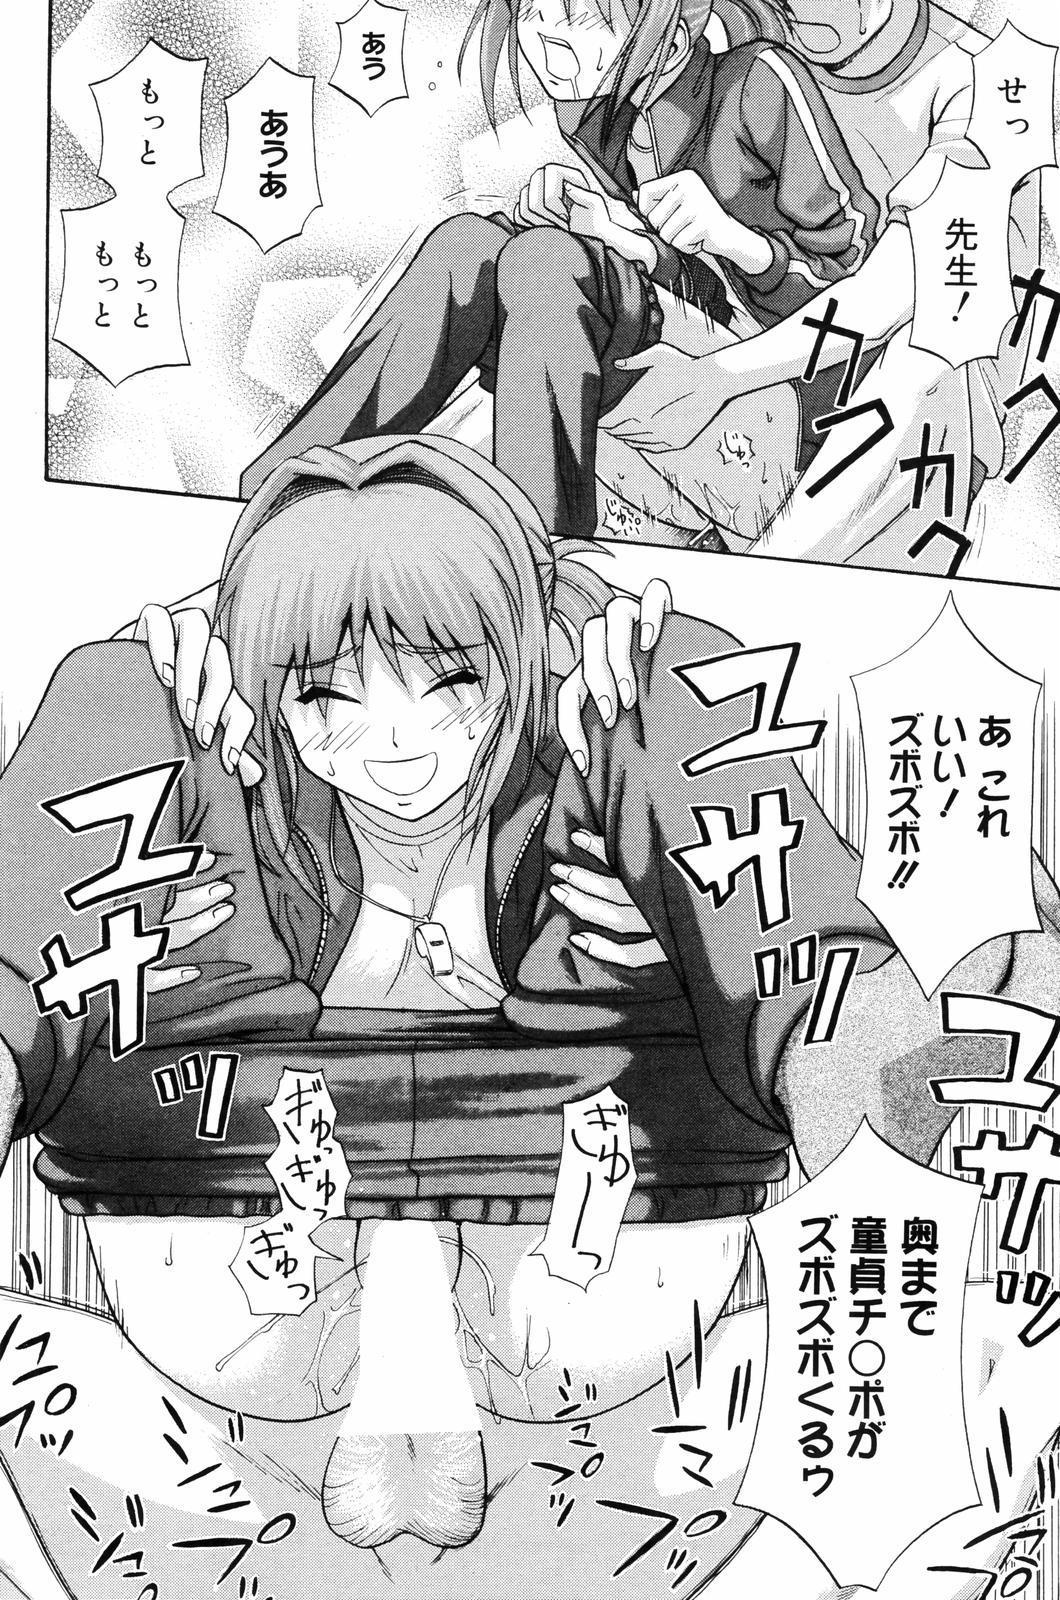 Manga Bangaichi 2008-03 93